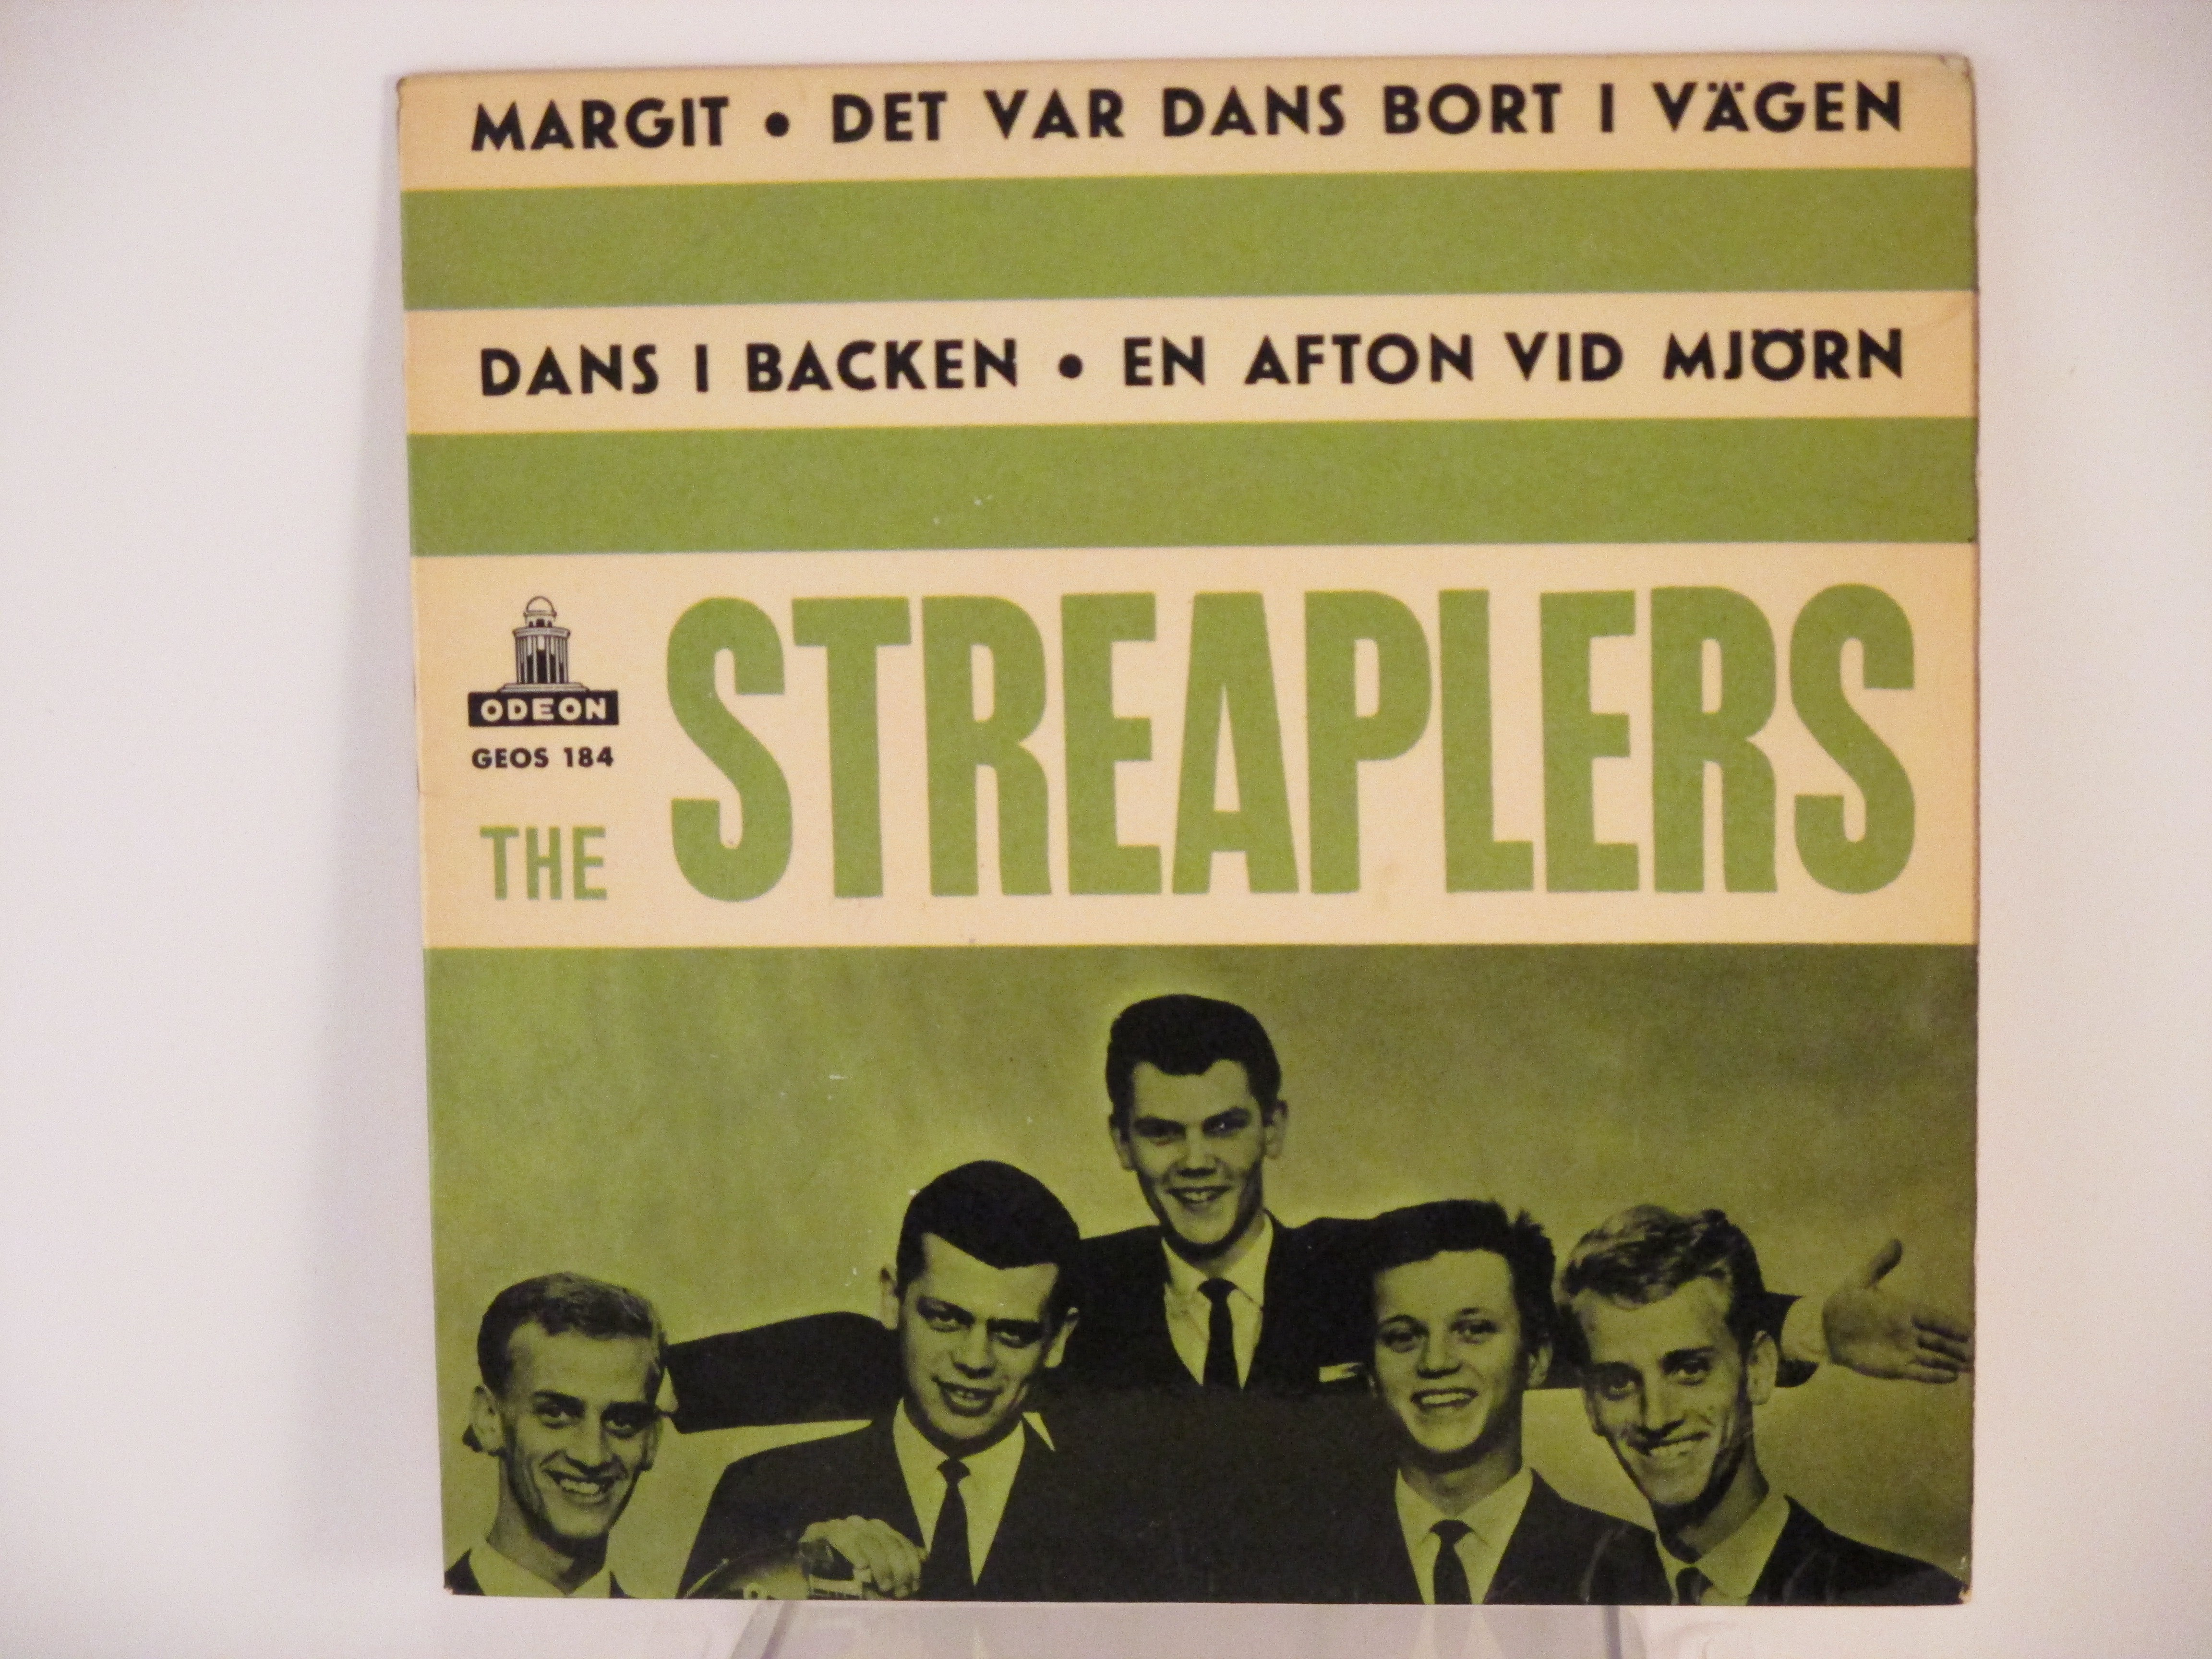 STREAPLERS : (EP) En afton vid Mjörn / Dans i backen / Margit / Det var dans bort i vägen